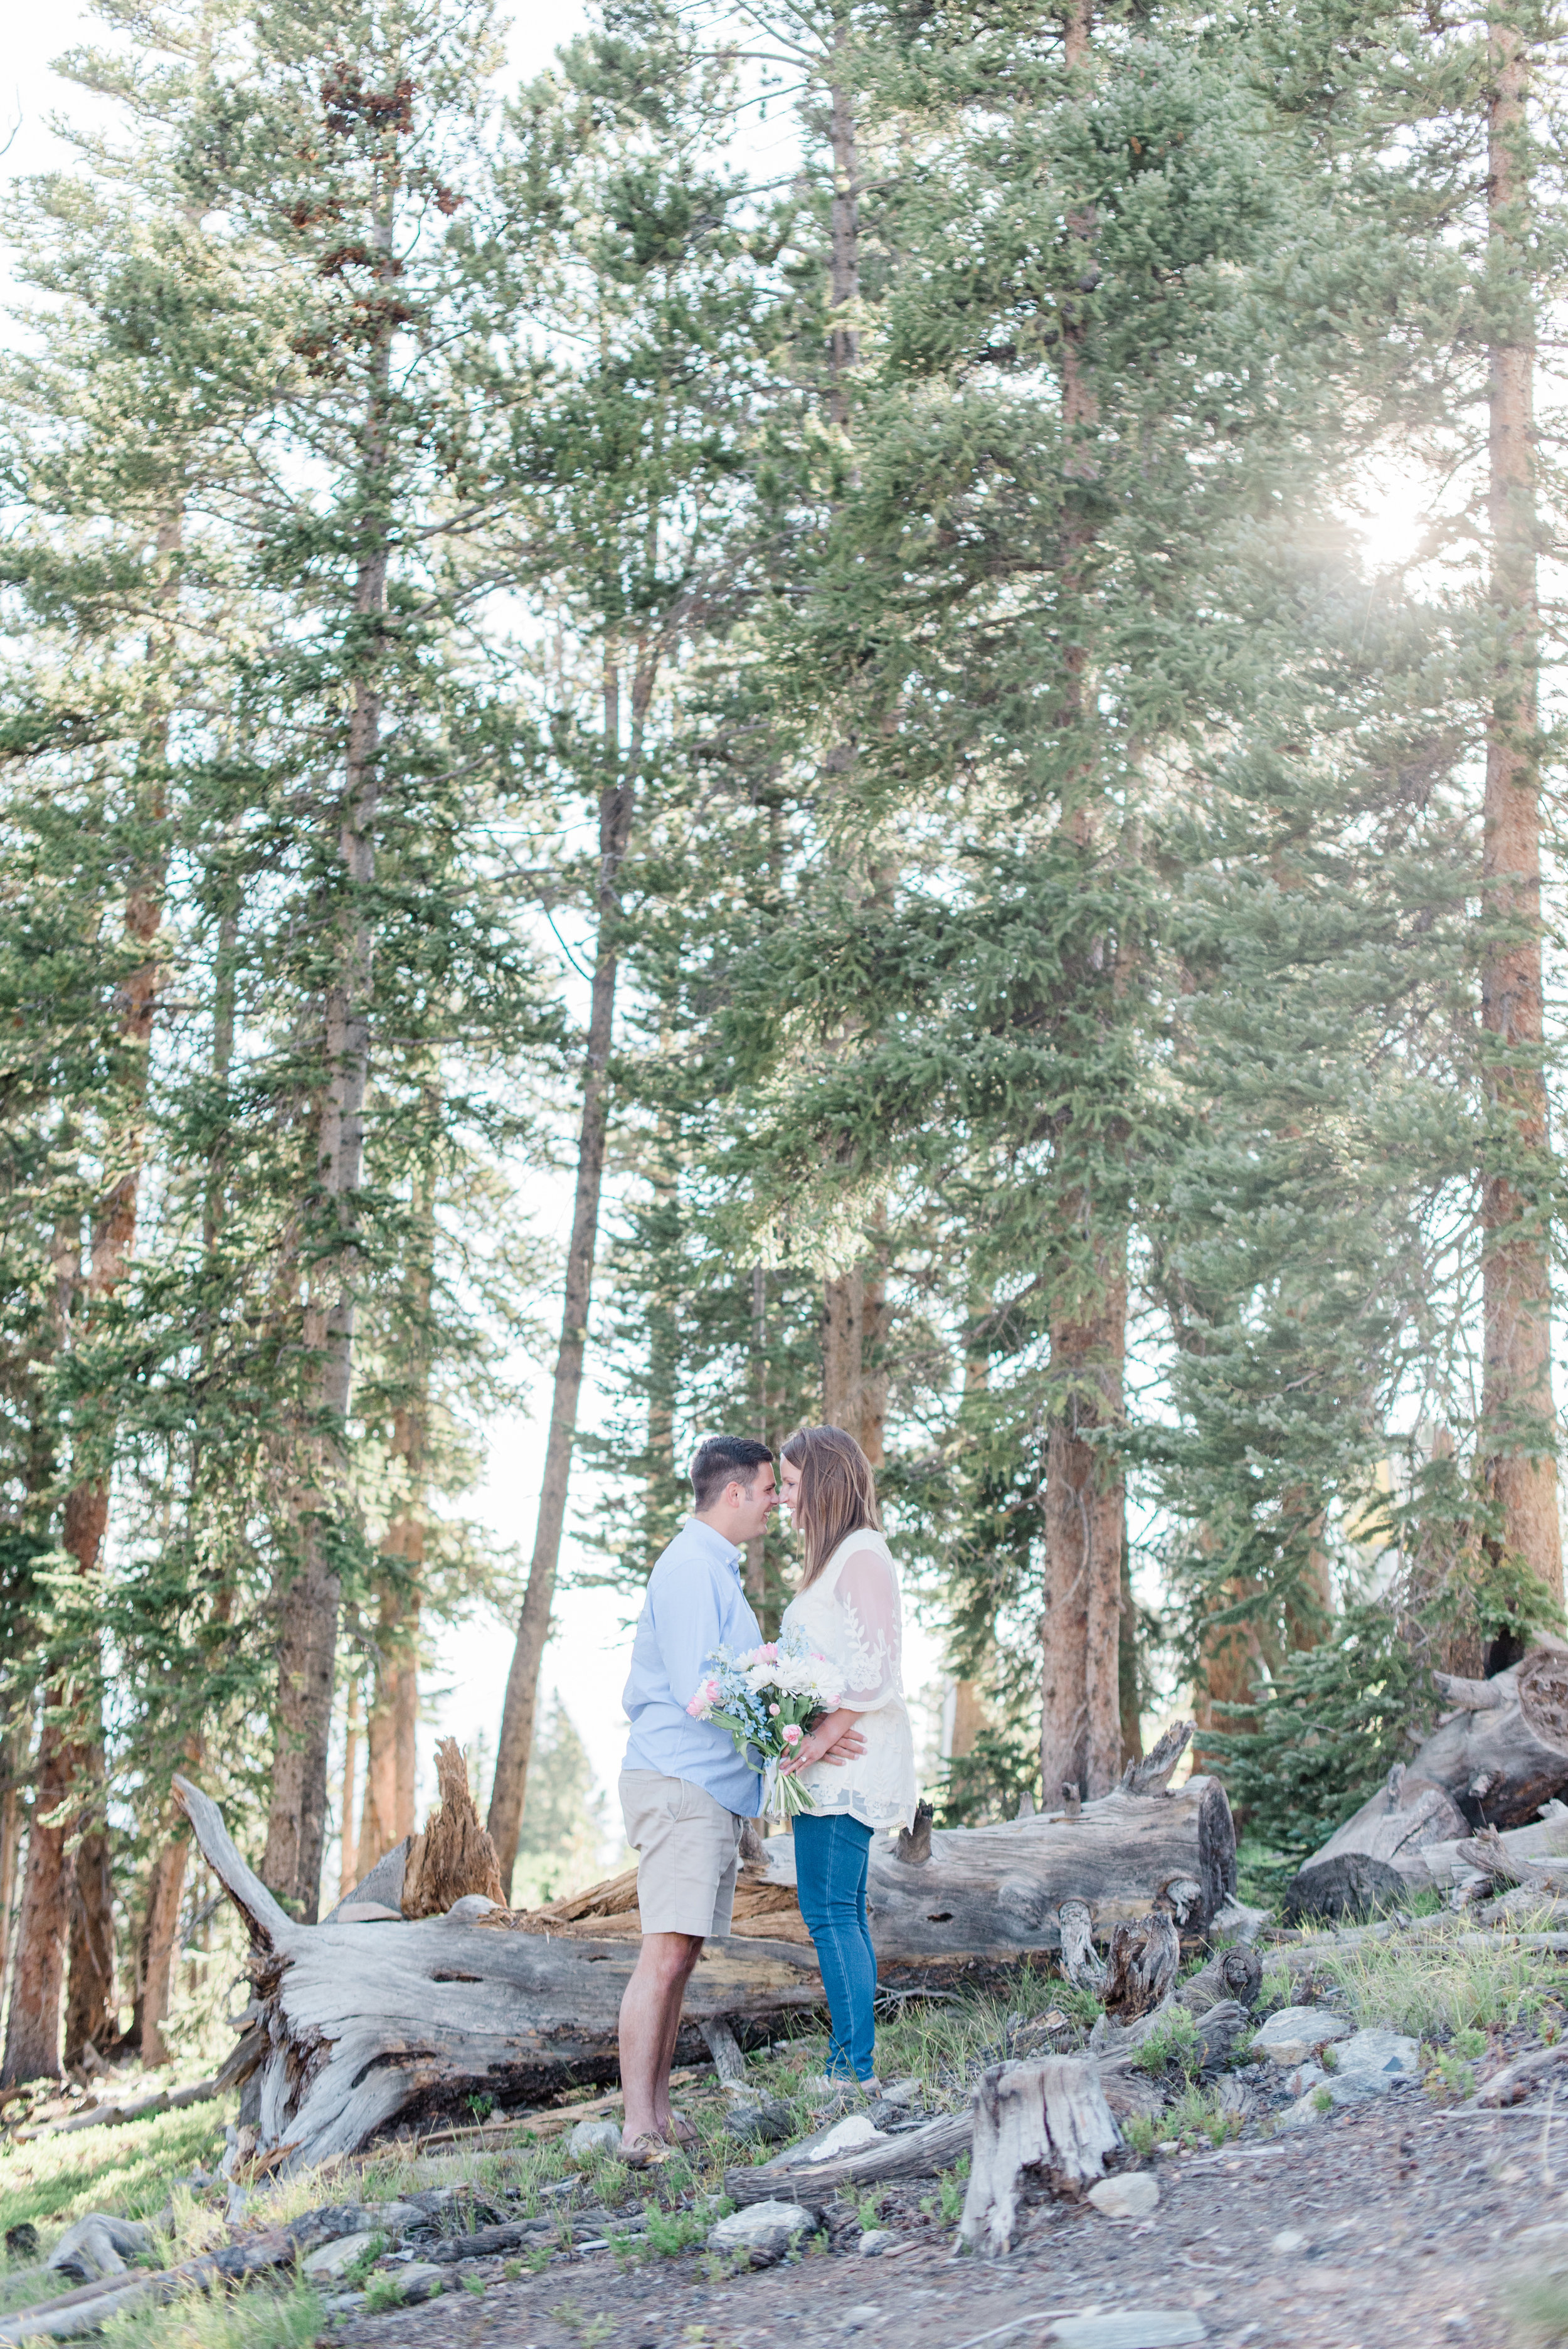 AshleighMillerPhotography-Adventure-Photography-Session-Elle-Christian-Colorado-17.jpg